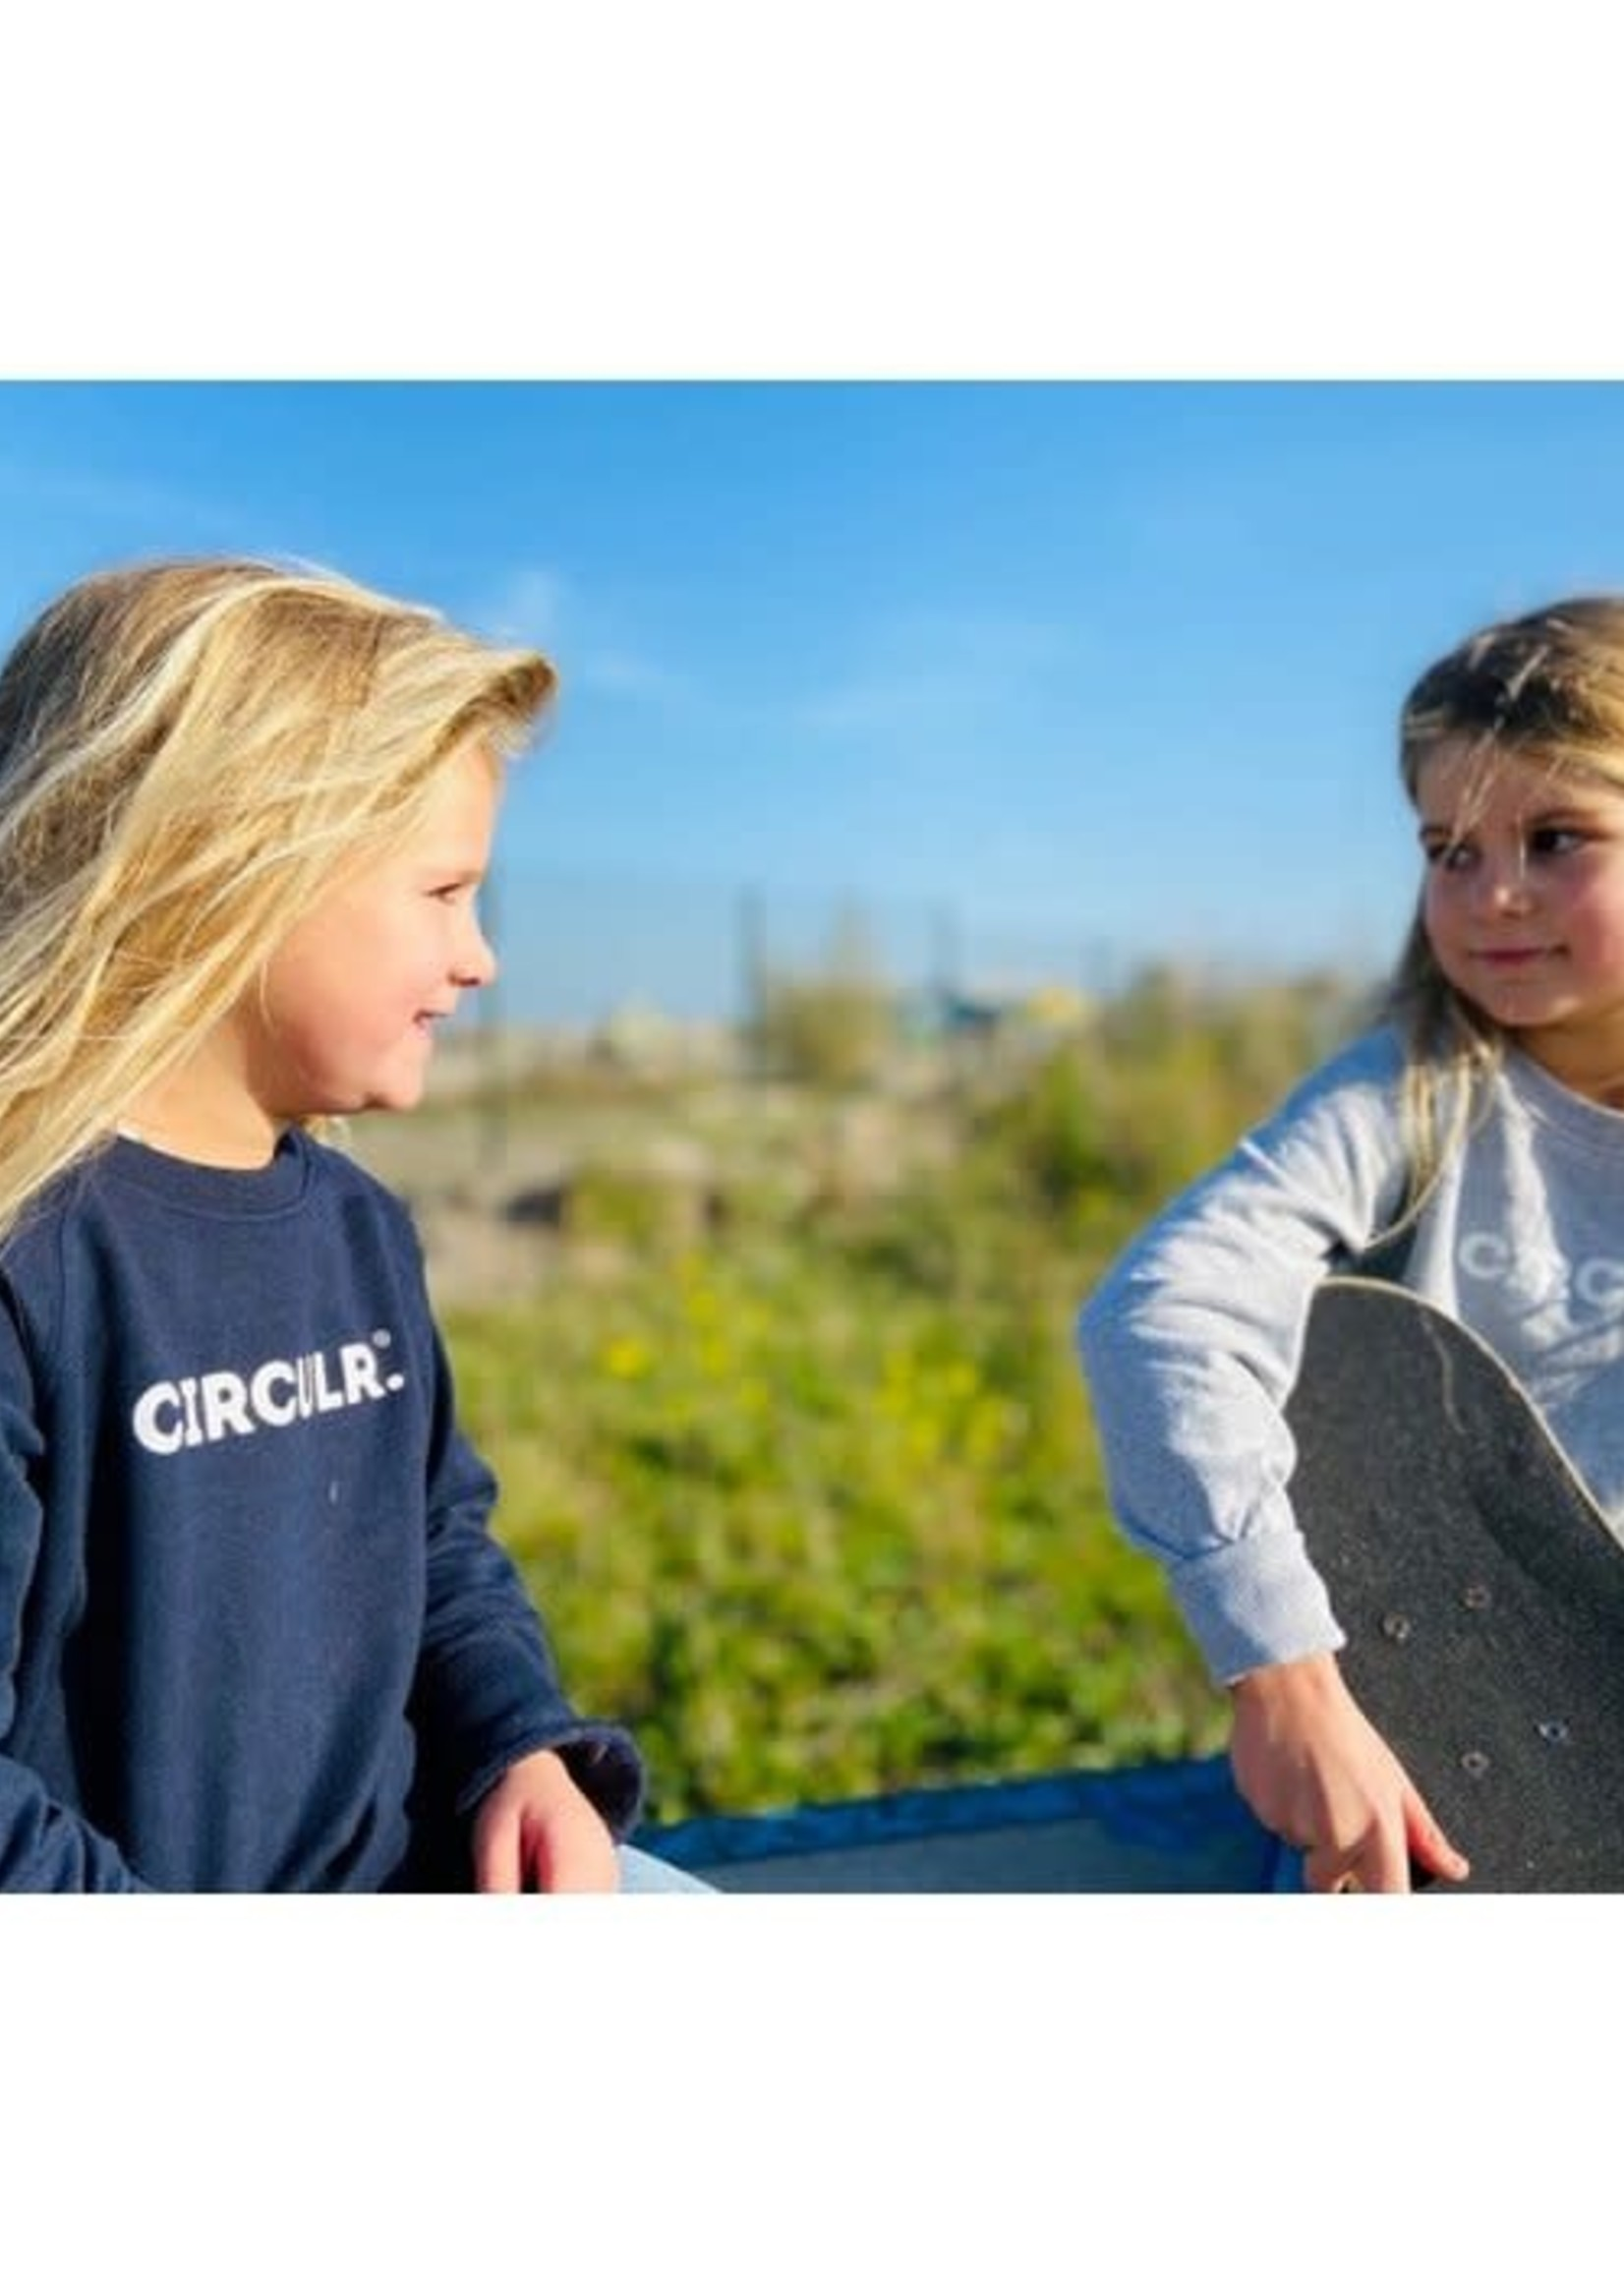 Woodlane CIRCULR. Sweater Kids Grey (unisex)